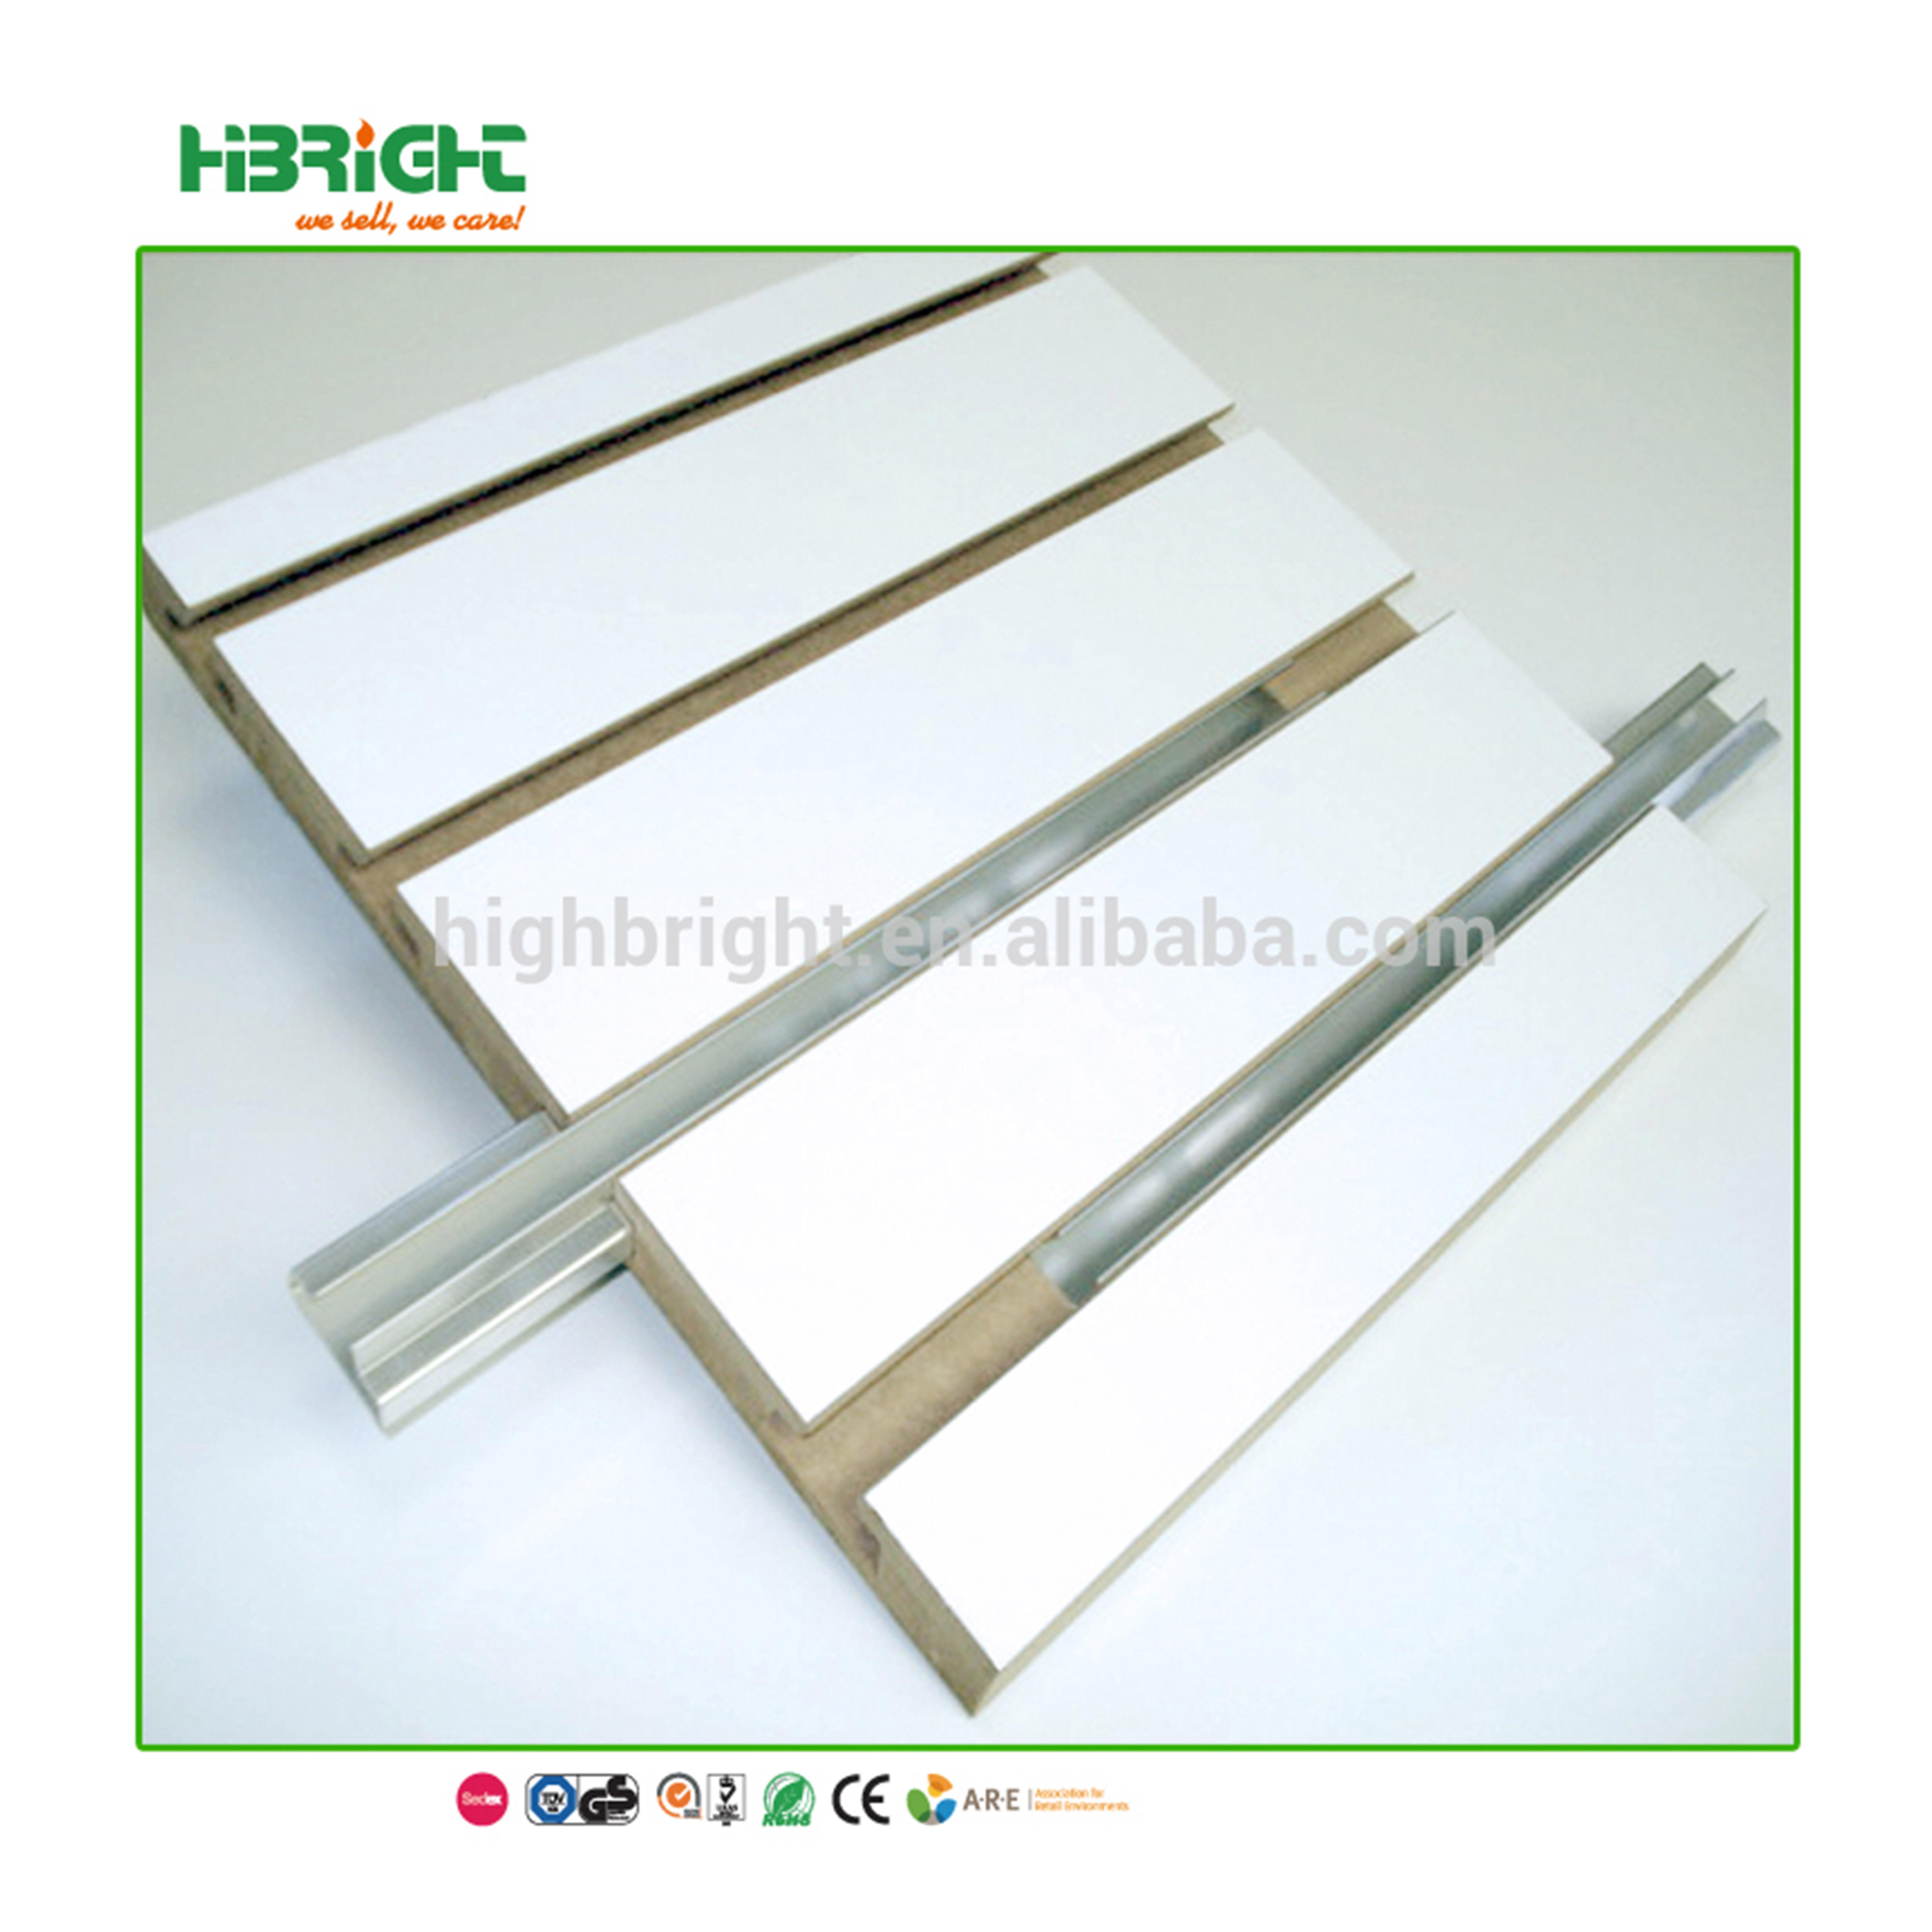 grade aluminium frame profile for MDF slatwall panel